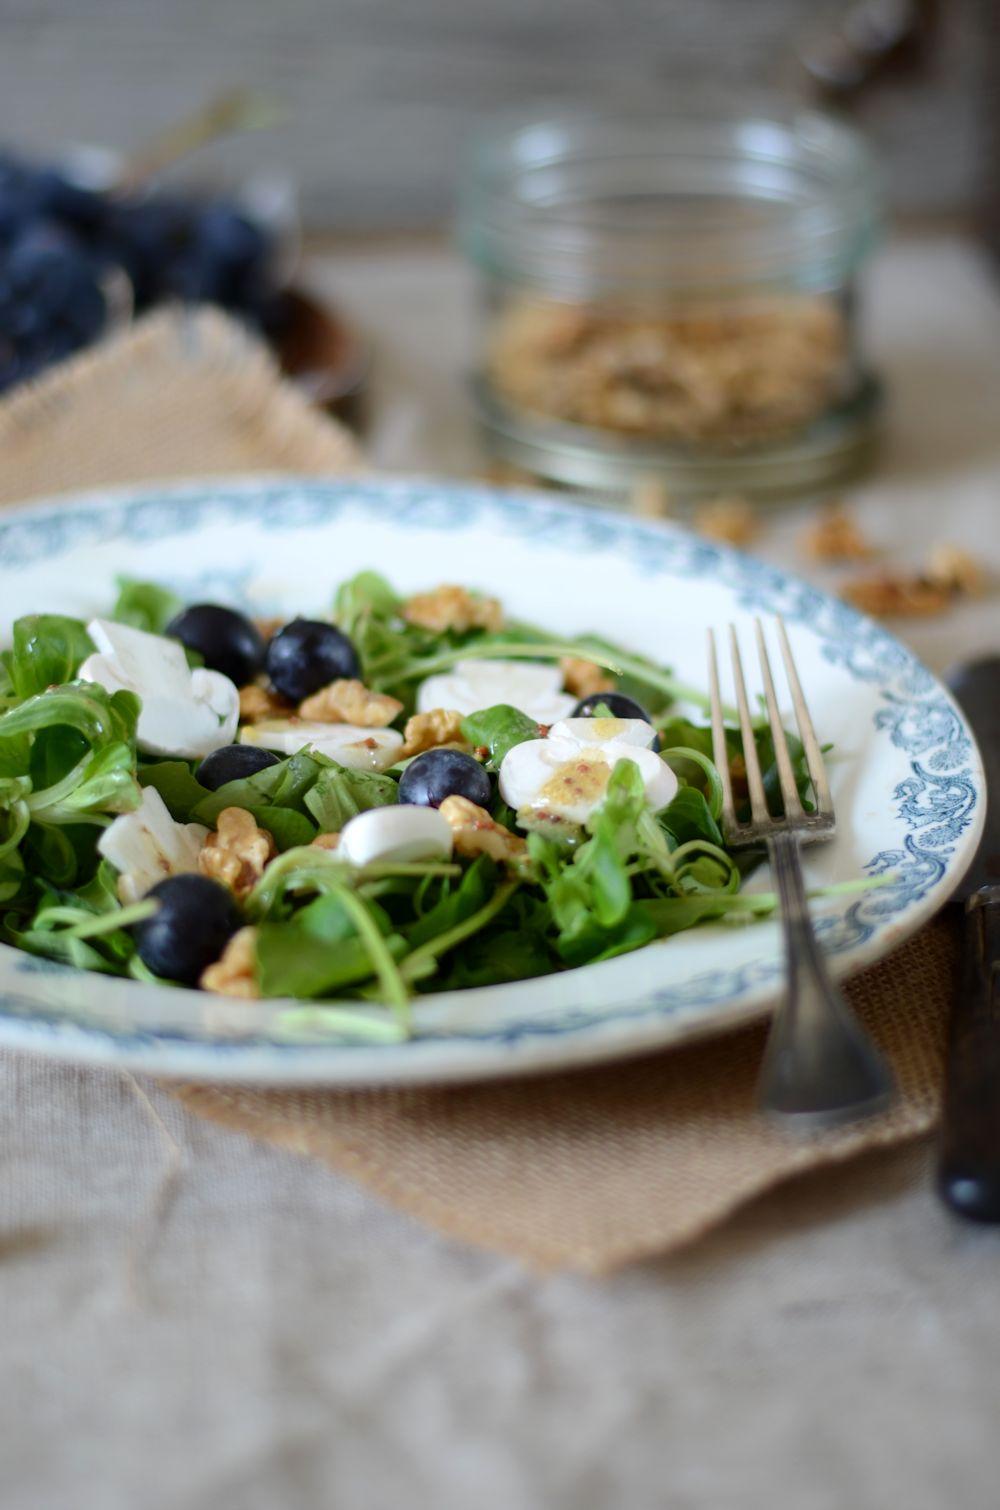 salade de roquette, champignons et raisin